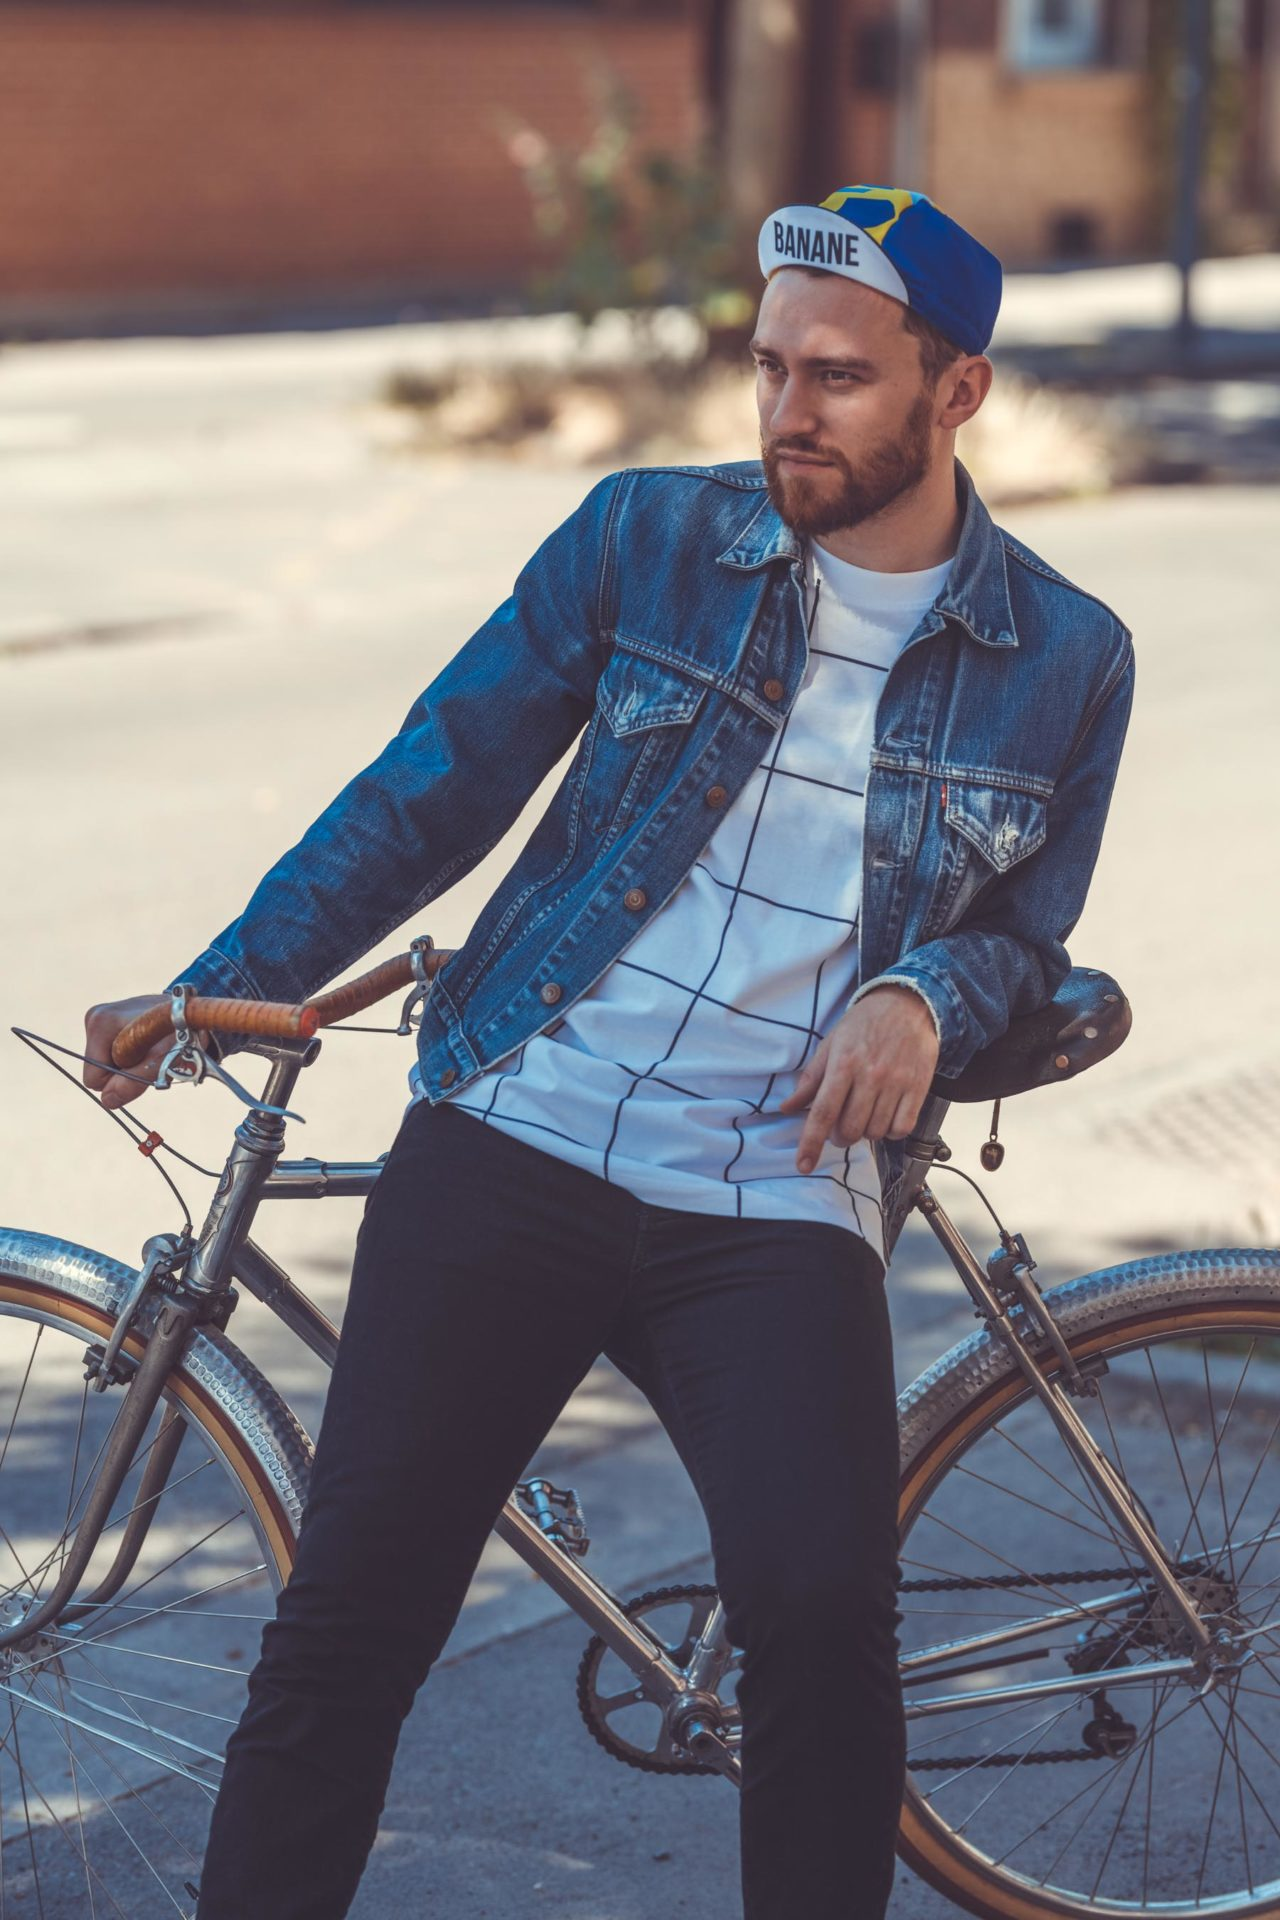 vera-cycling-selection-web-78